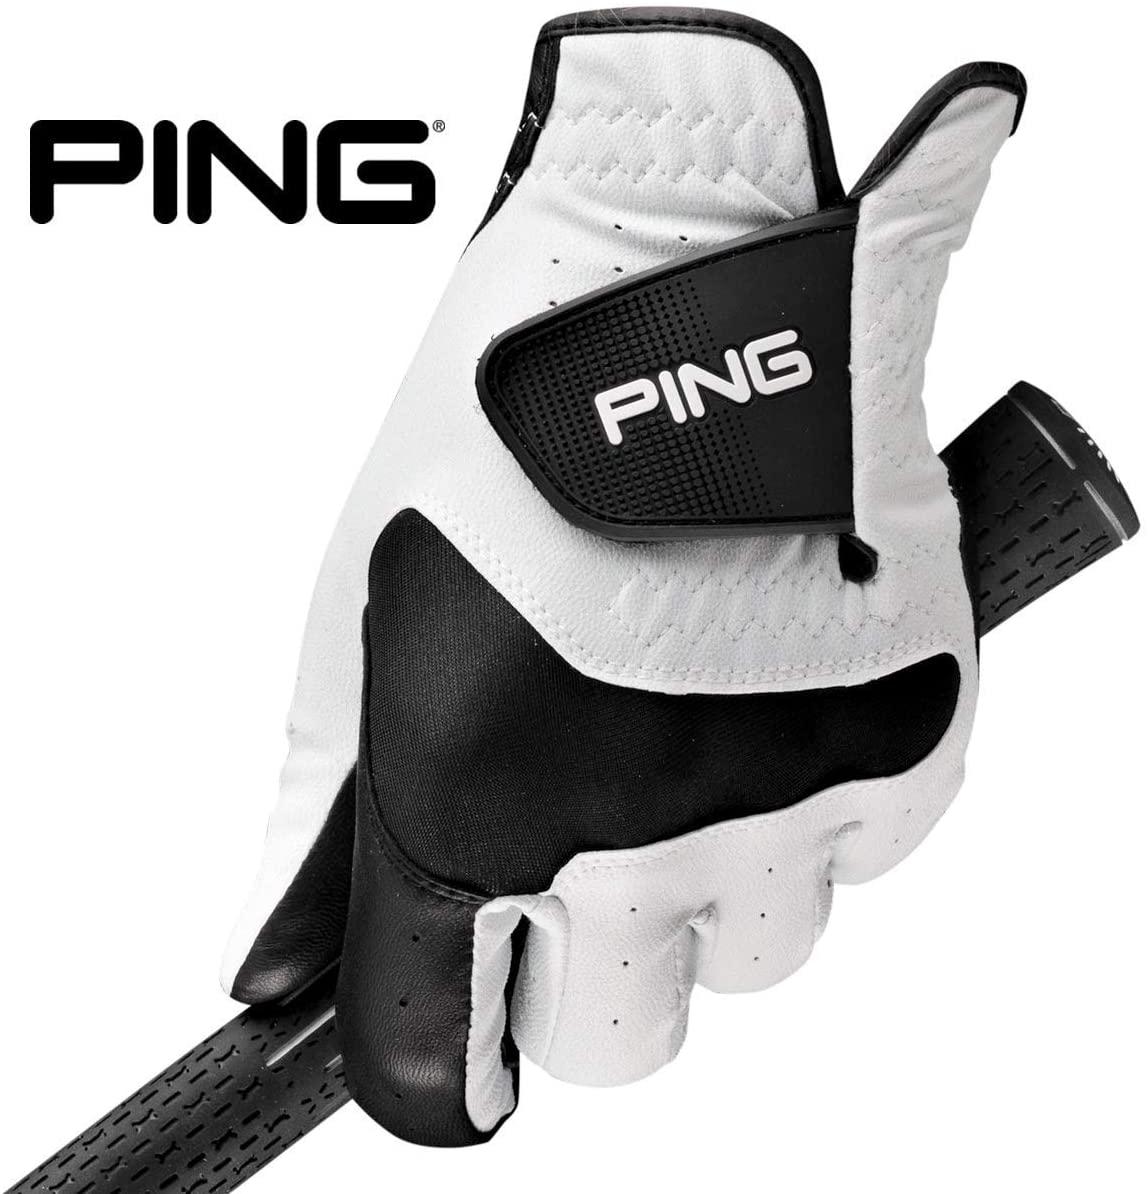 New 2019 PING Sport Men's Glove with SensorCool Technology (Cadet S - Worn on LH)